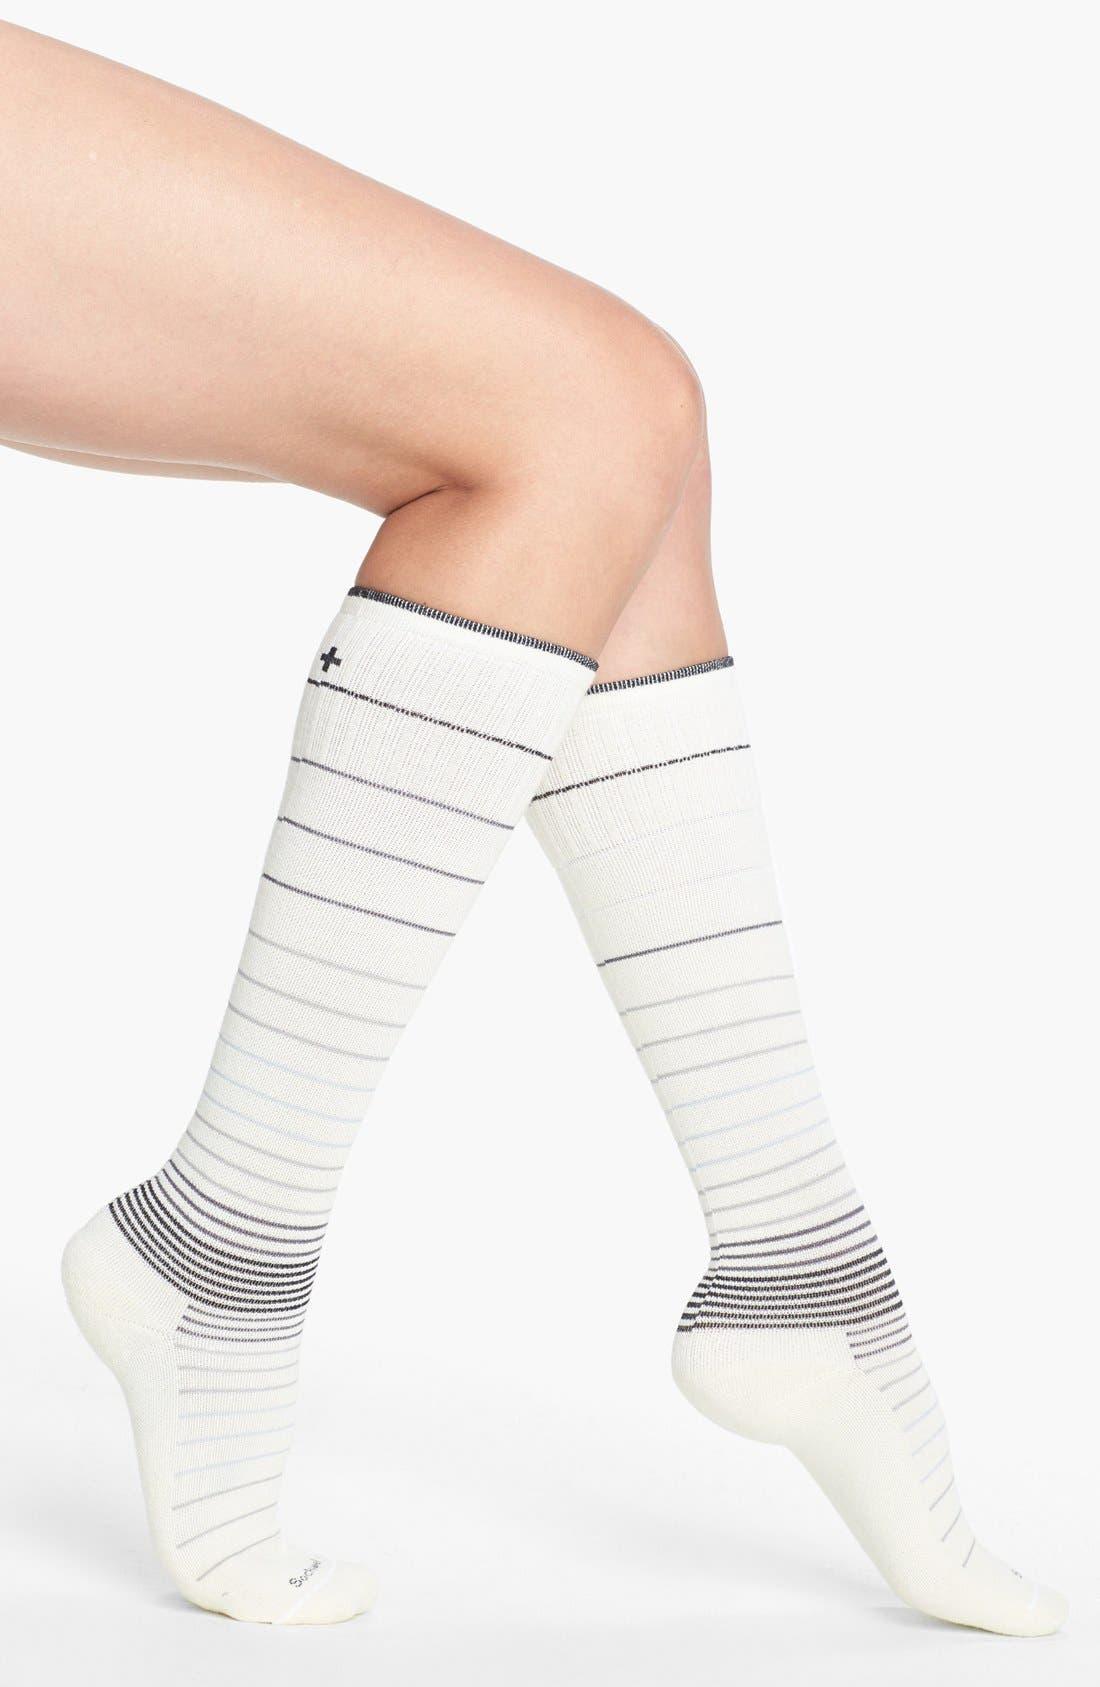 Alternate Image 1 Selected - Sockwell Goodhew - Circulator Compression Socks